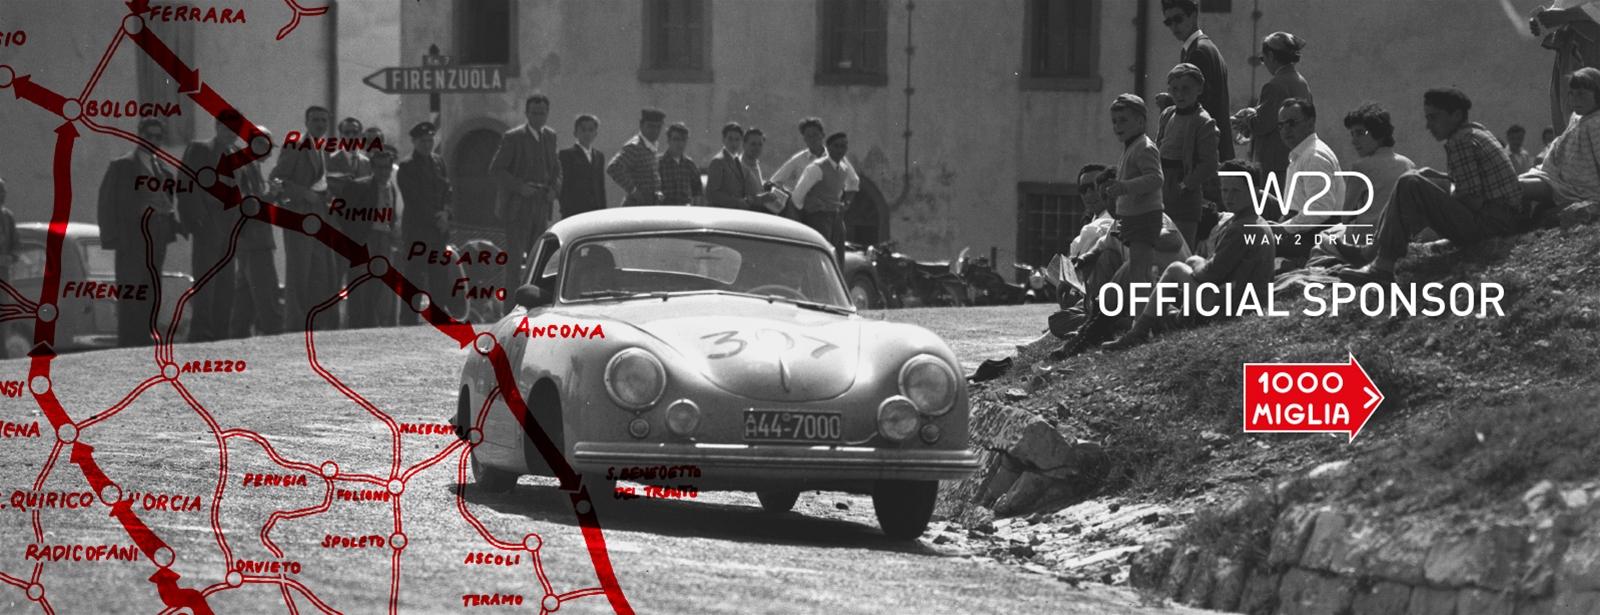 W2D official sponsor Mille Miglia